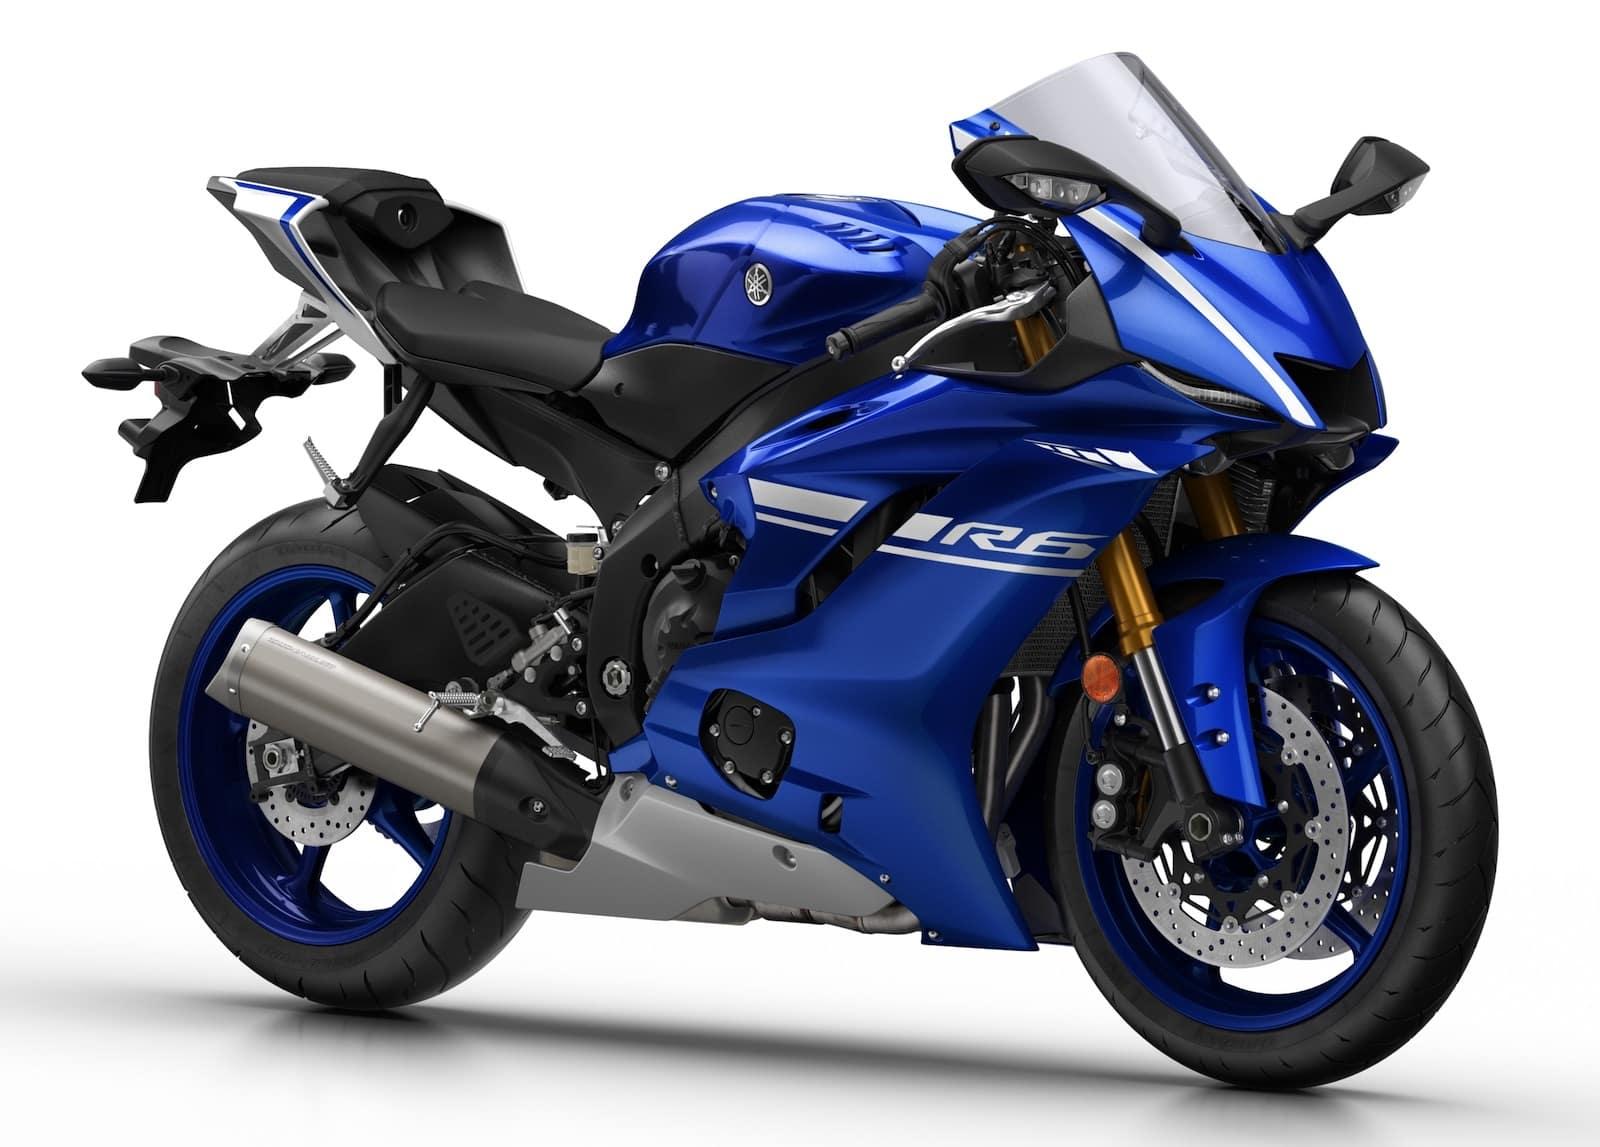 Latest generation Yamaha R6, 2017-present